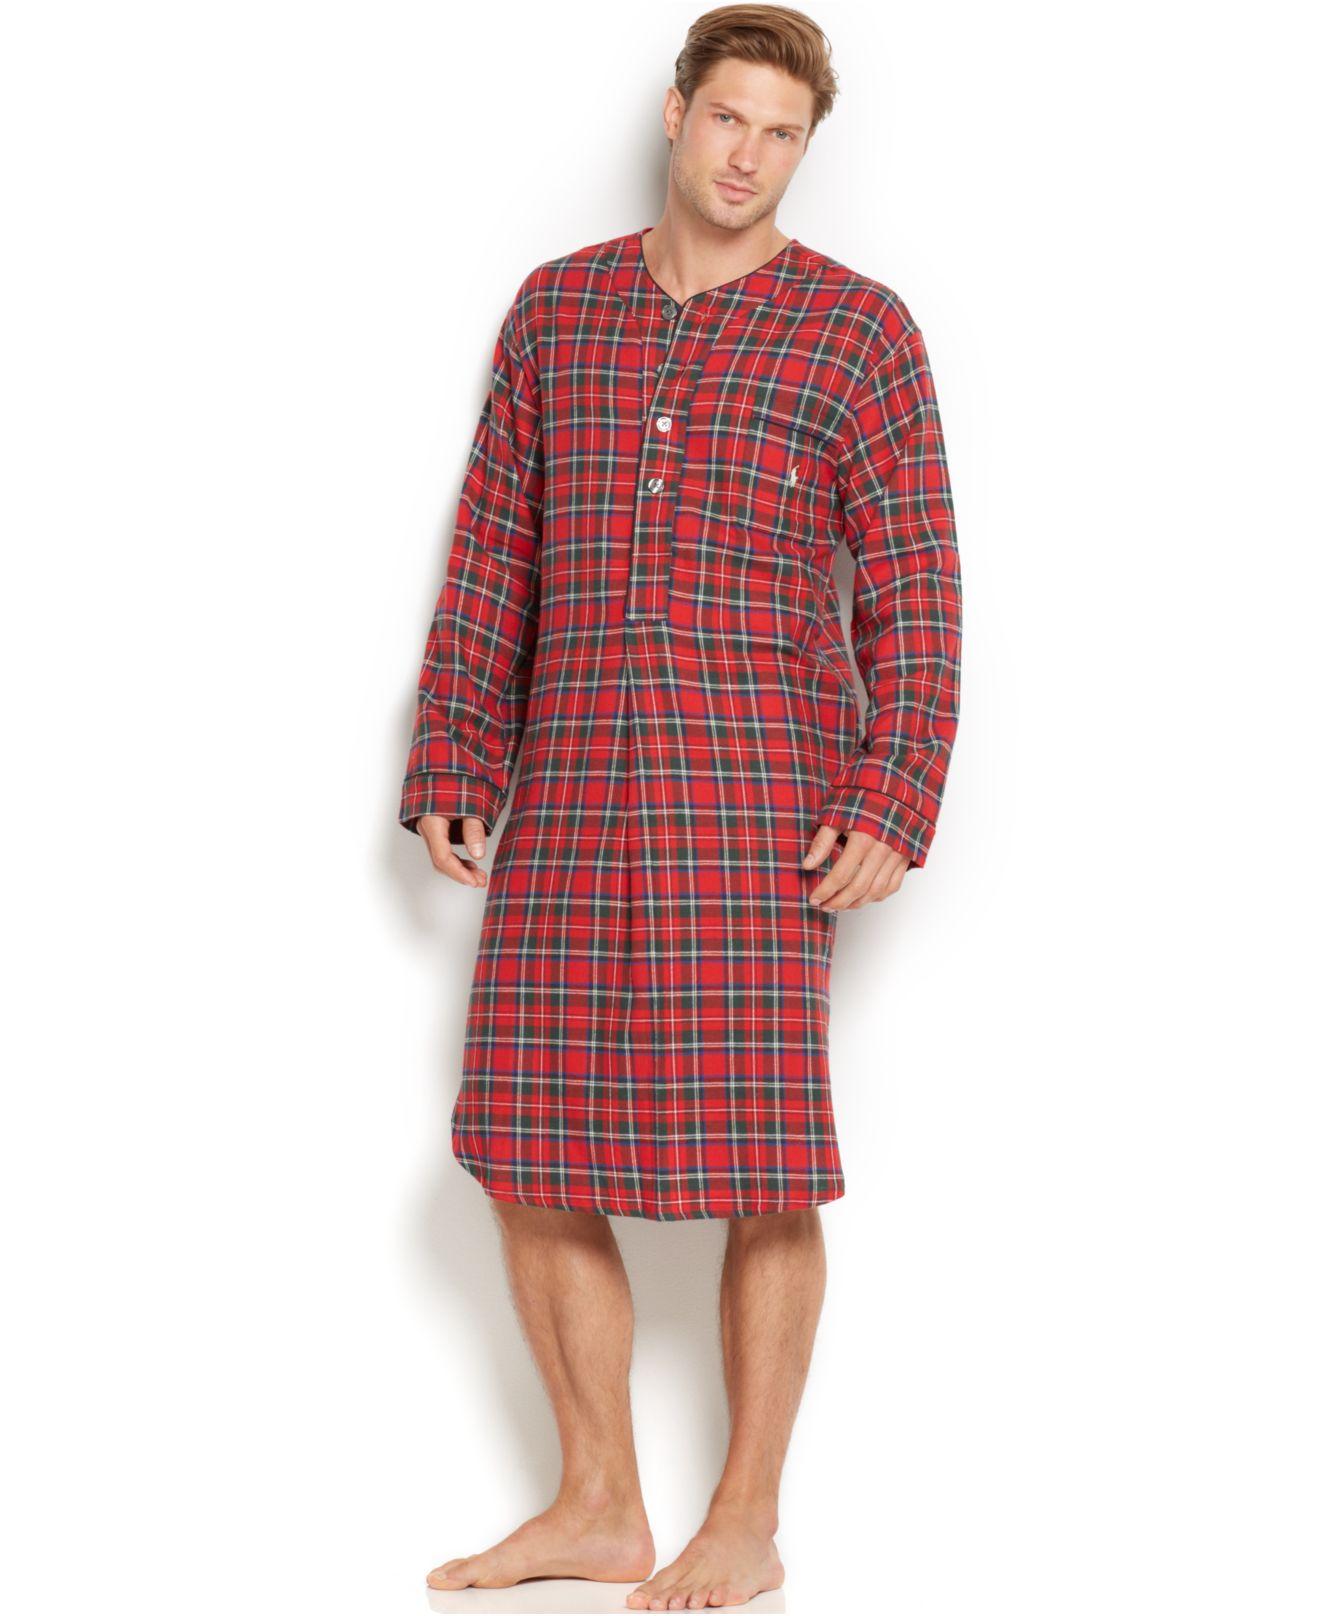 Lyst - Polo Ralph Lauren Men\'S Plaid Flannel Pajama Nightshirt in ...